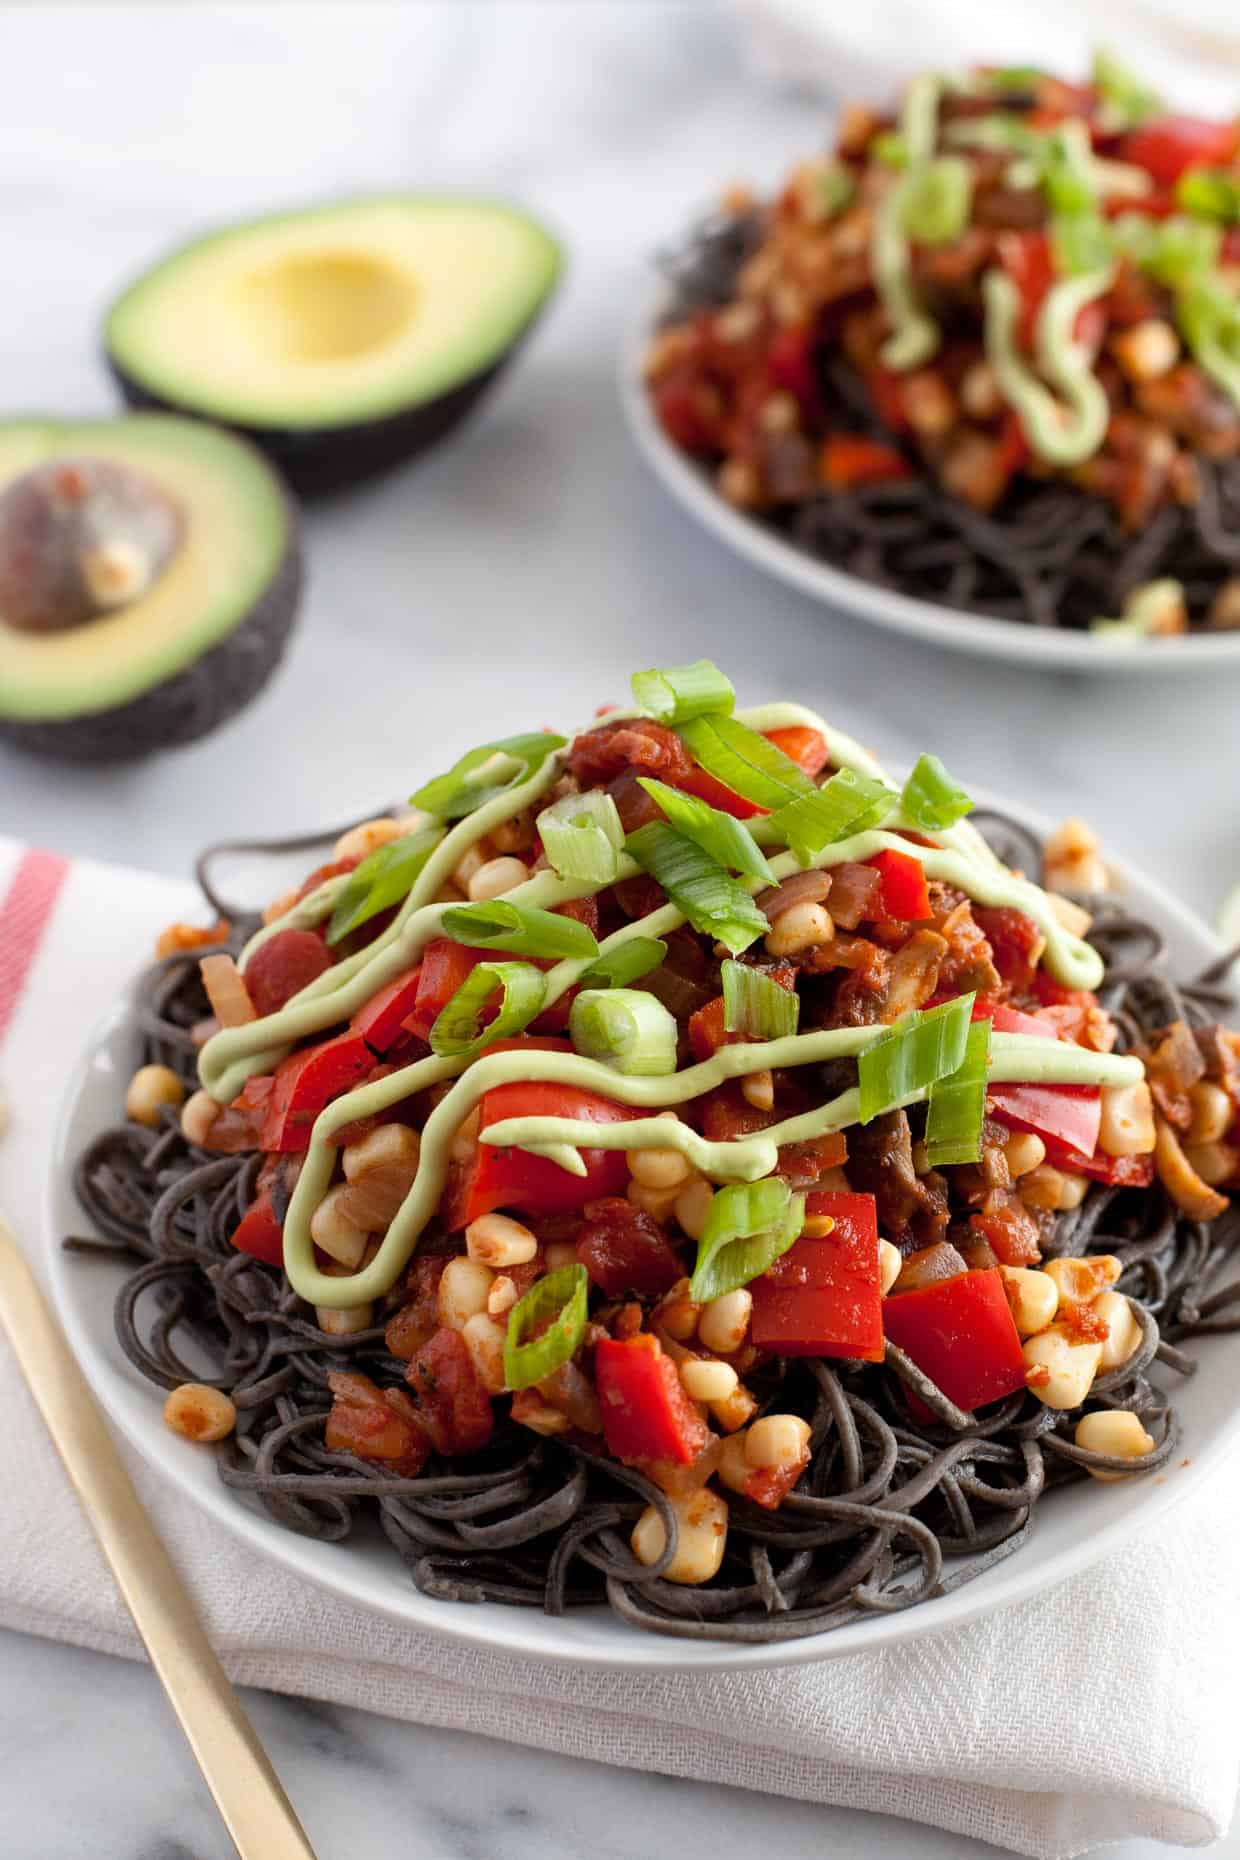 Southwestern Black Bean Spaghetti